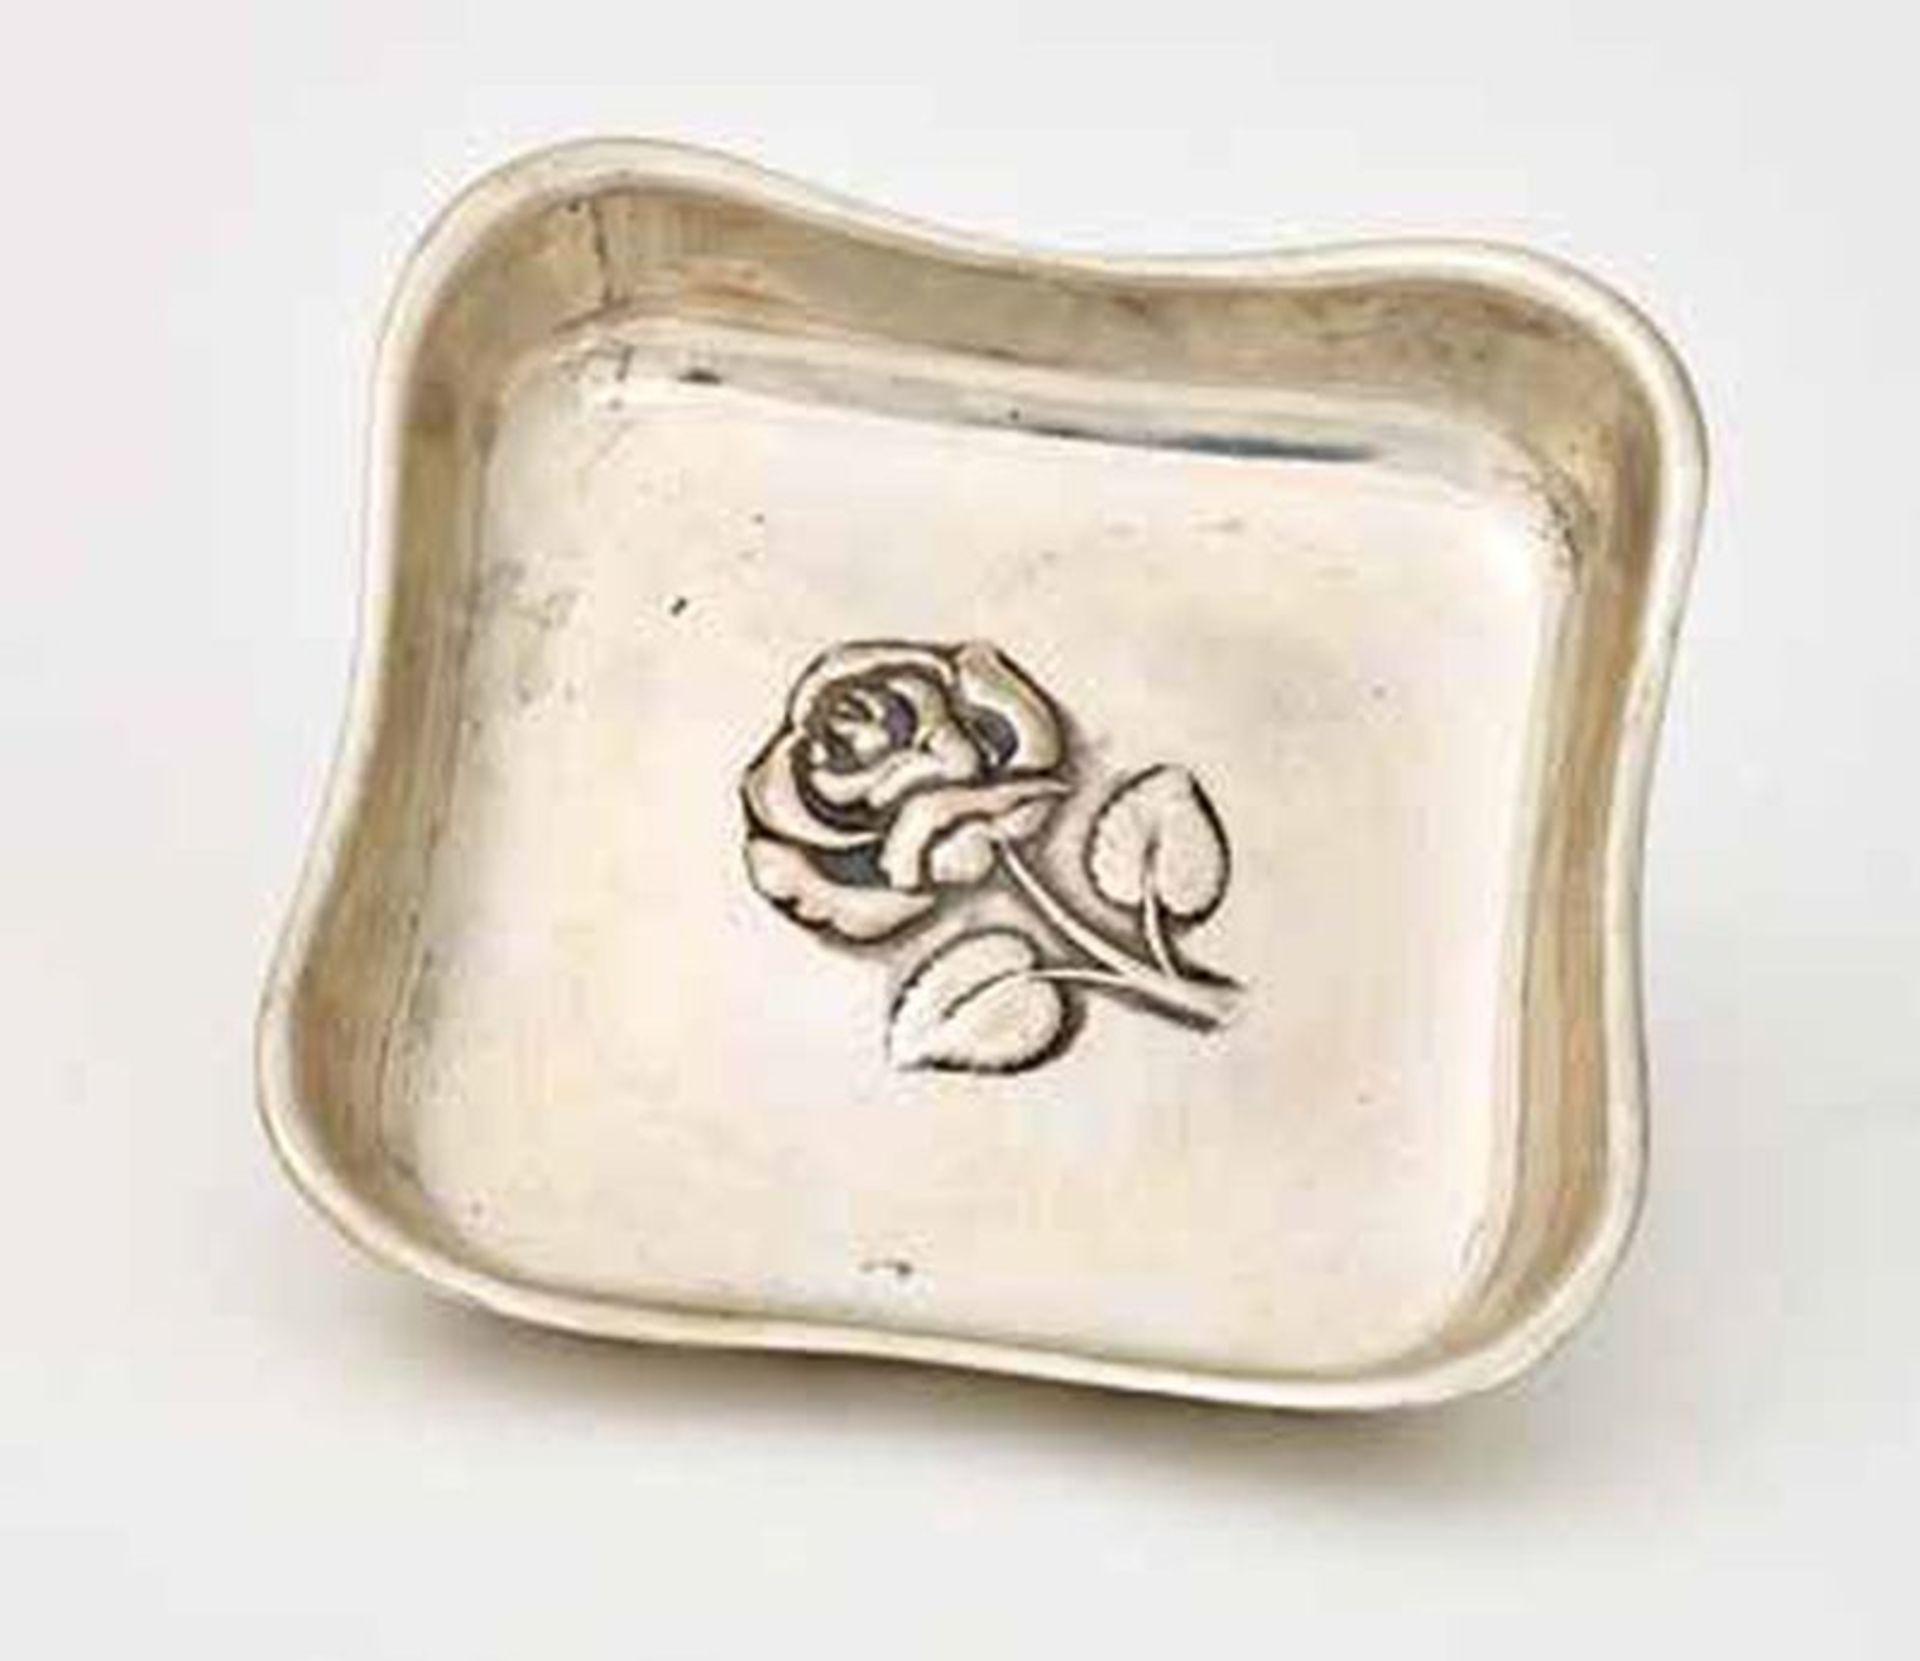 Austrian plate, Vienna silversmith Alexander Sturm, - beginning of the XXth [...]